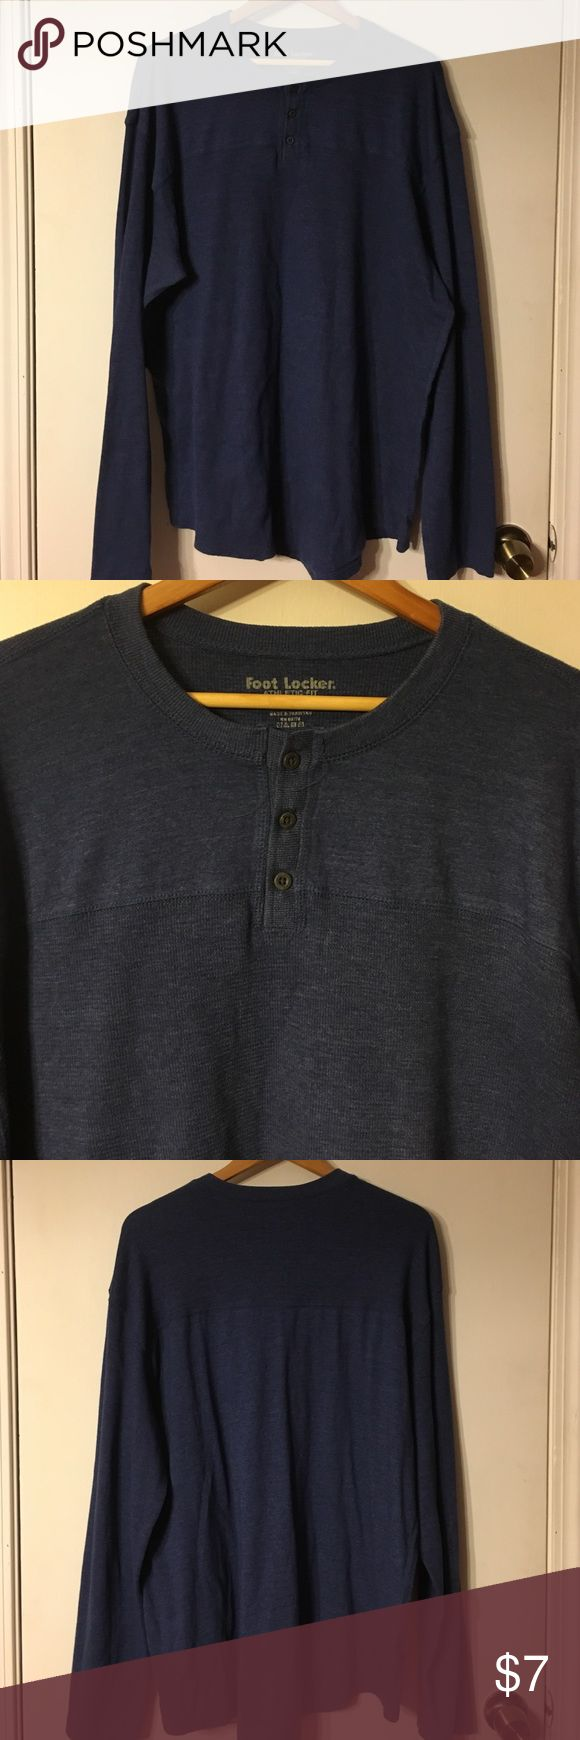 Footlocker men's blue Henley shirt Sz 3XL In excellent condition showing little to no wear footlocker Shirts Tees - Long Sleeve